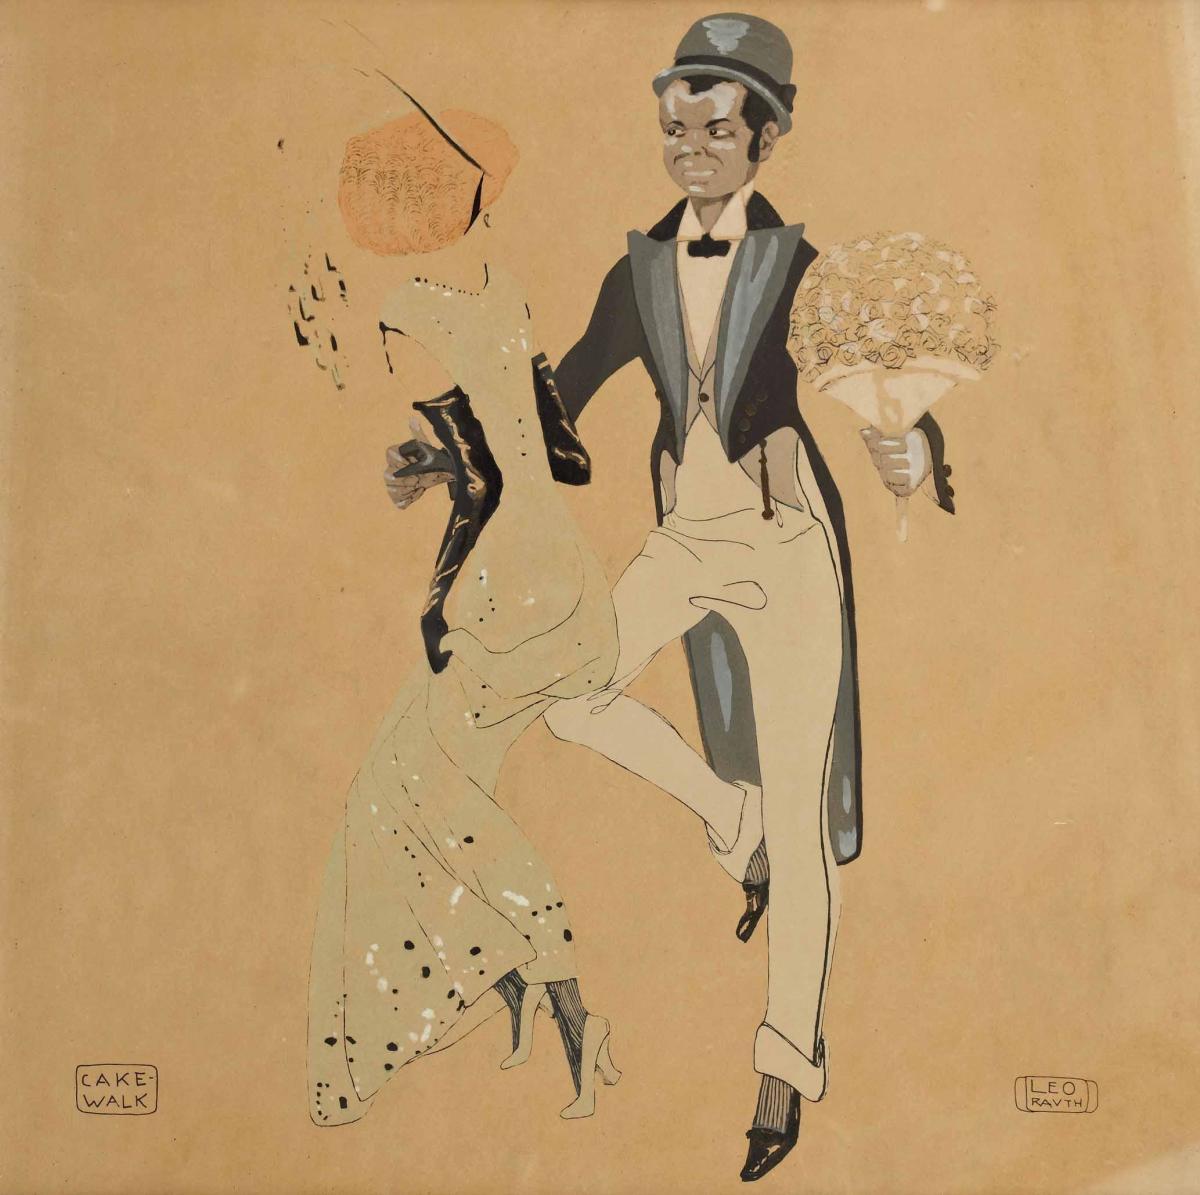 """Cake-Walk"" by Leo Rauth, 1913 - public domain"